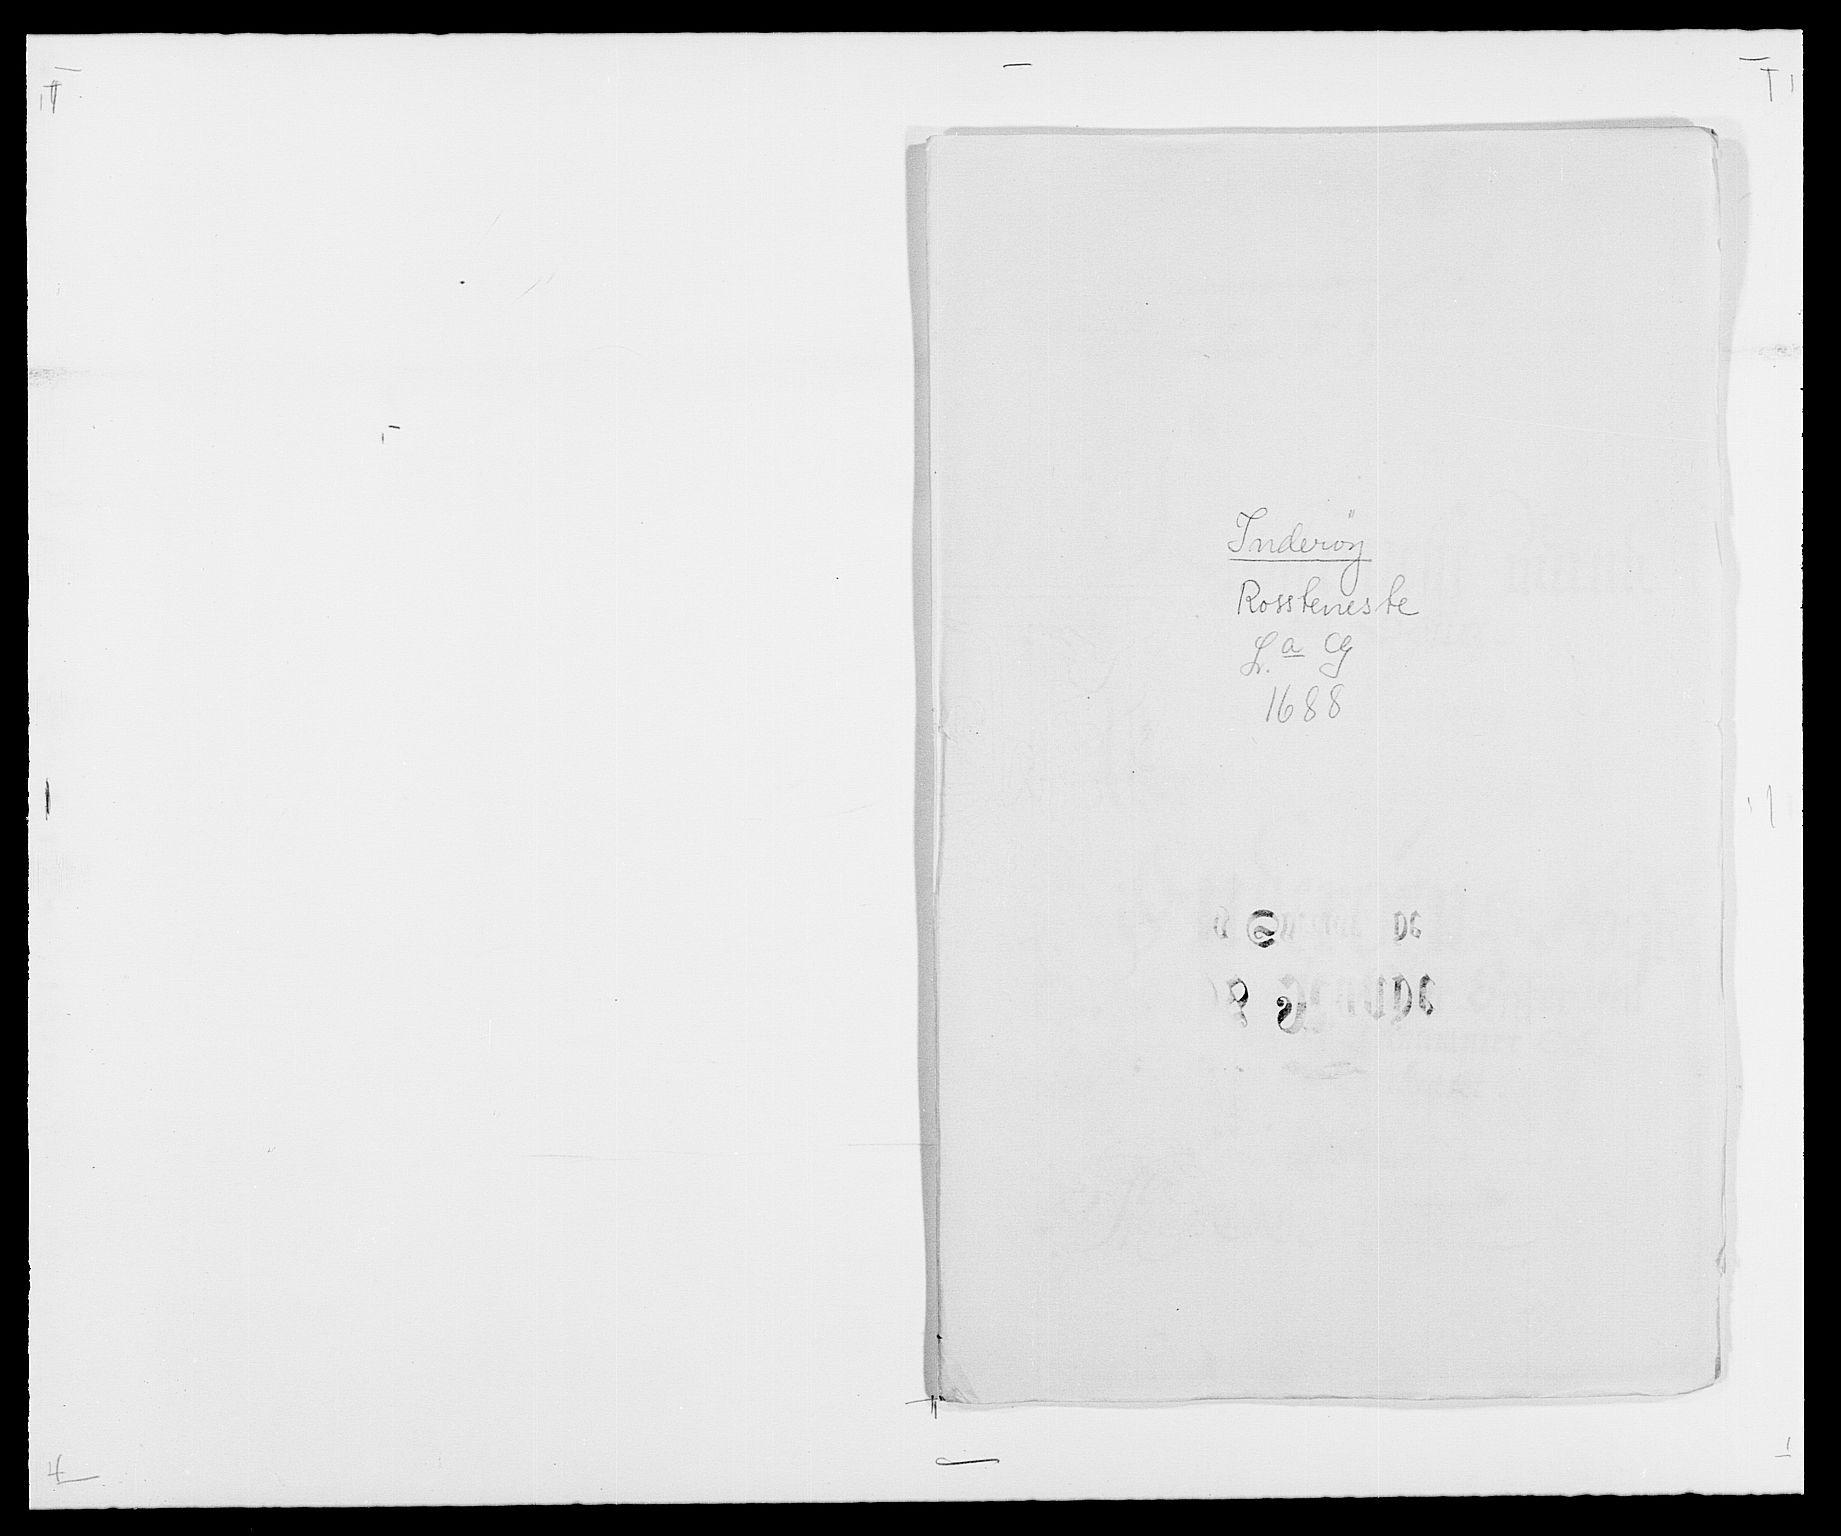 RA, Rentekammeret inntil 1814, Reviderte regnskaper, Fogderegnskap, R63/L4306: Fogderegnskap Inderøy, 1687-1689, s. 283